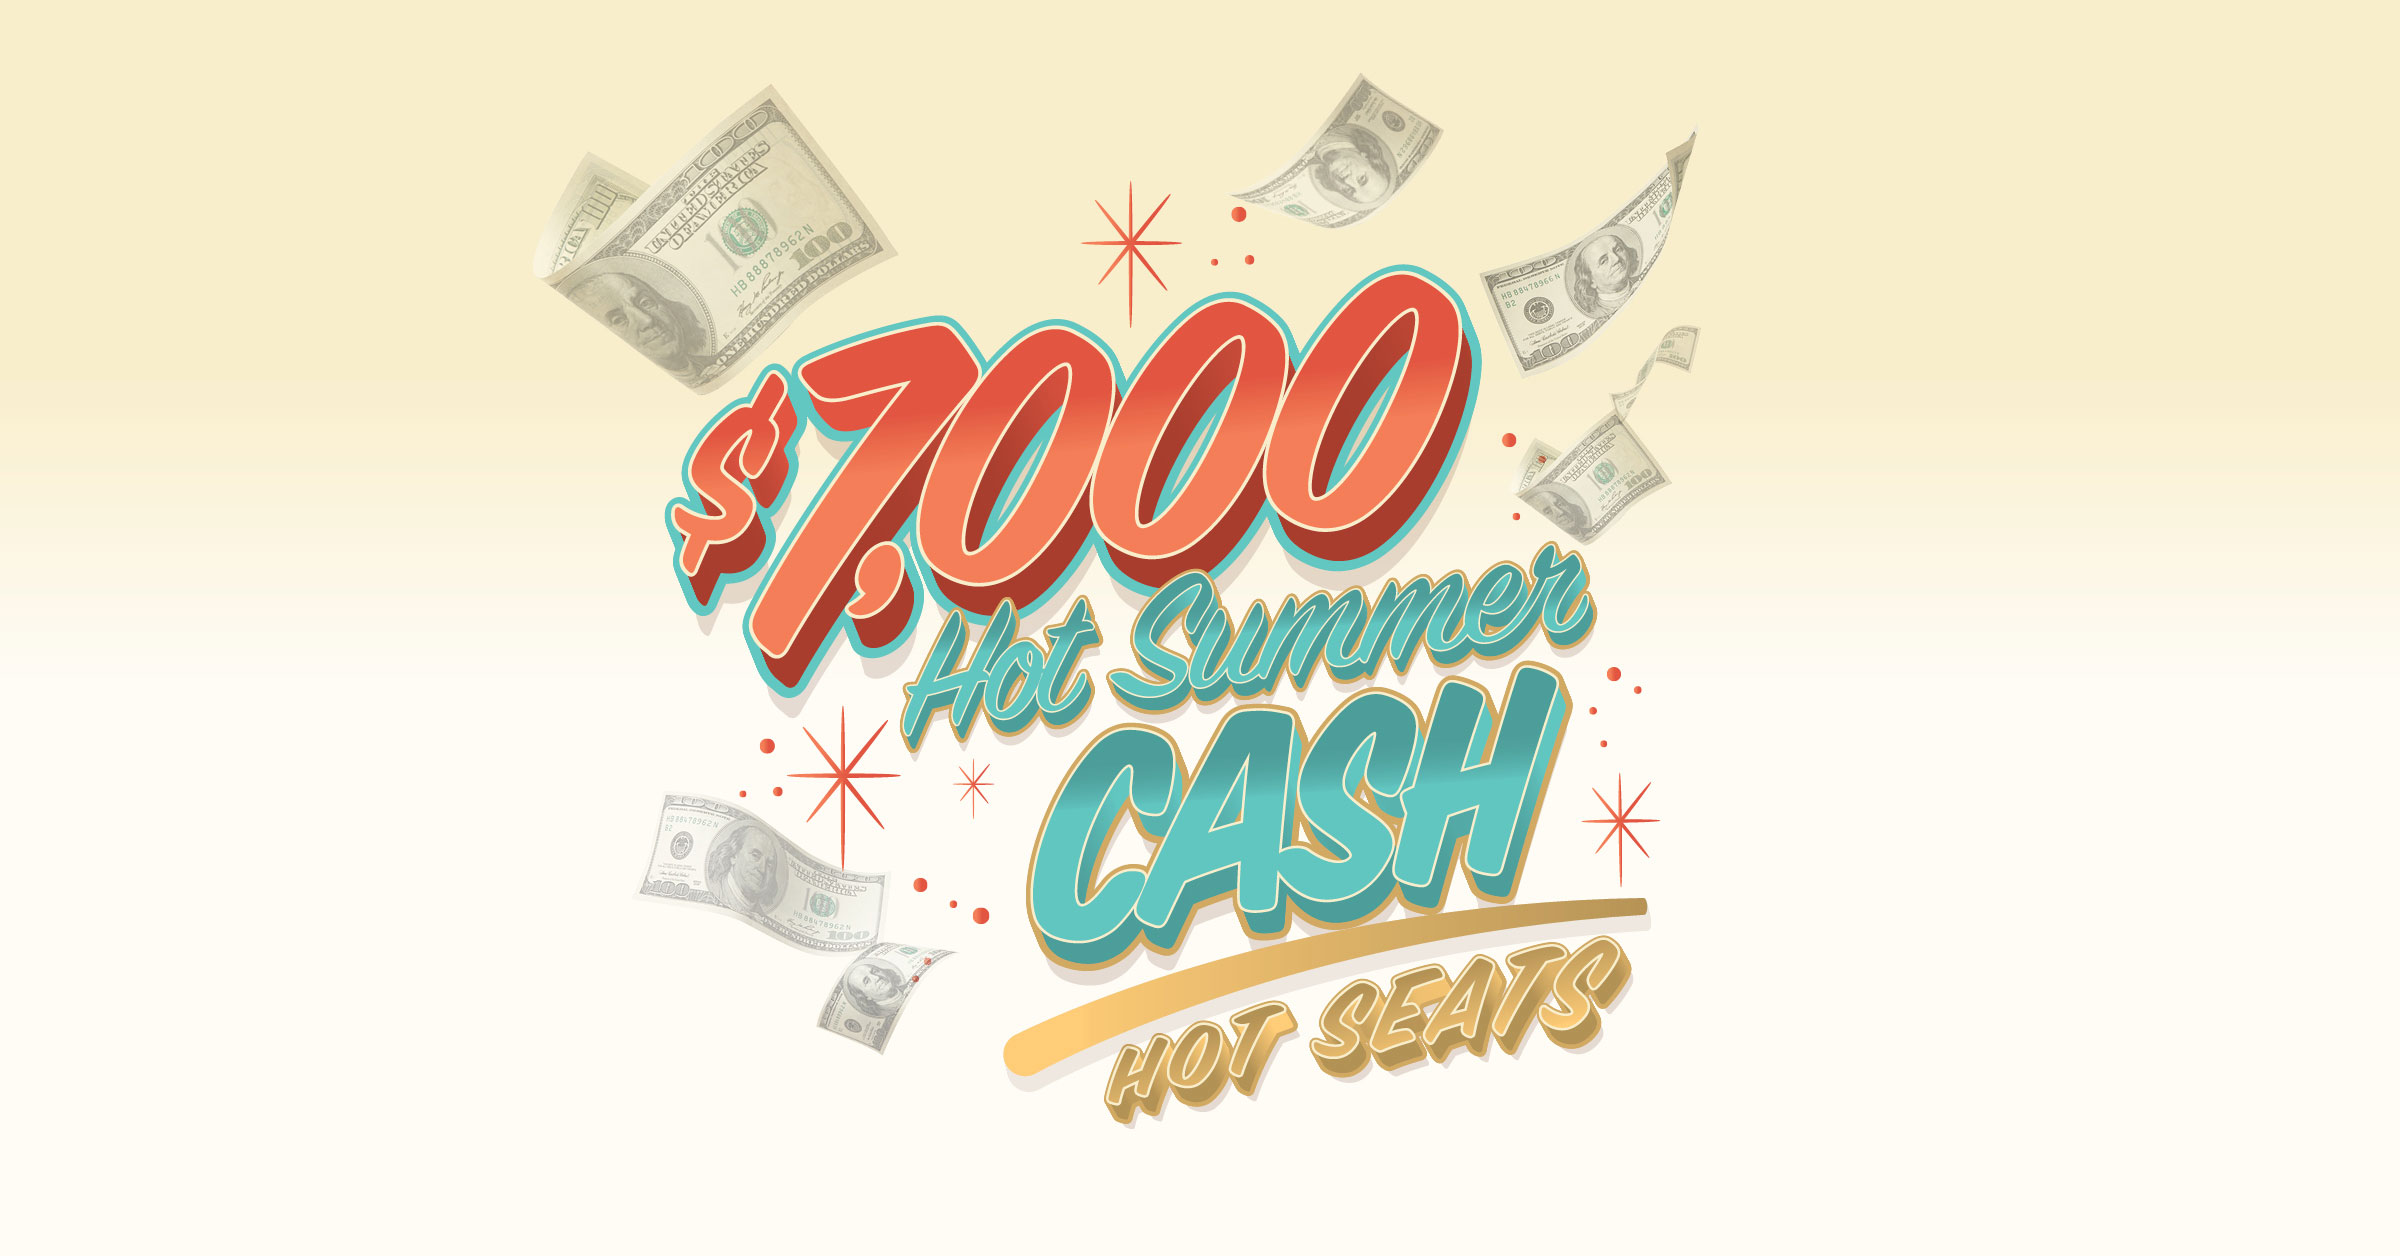 Hot Summer Cash Hot Seats